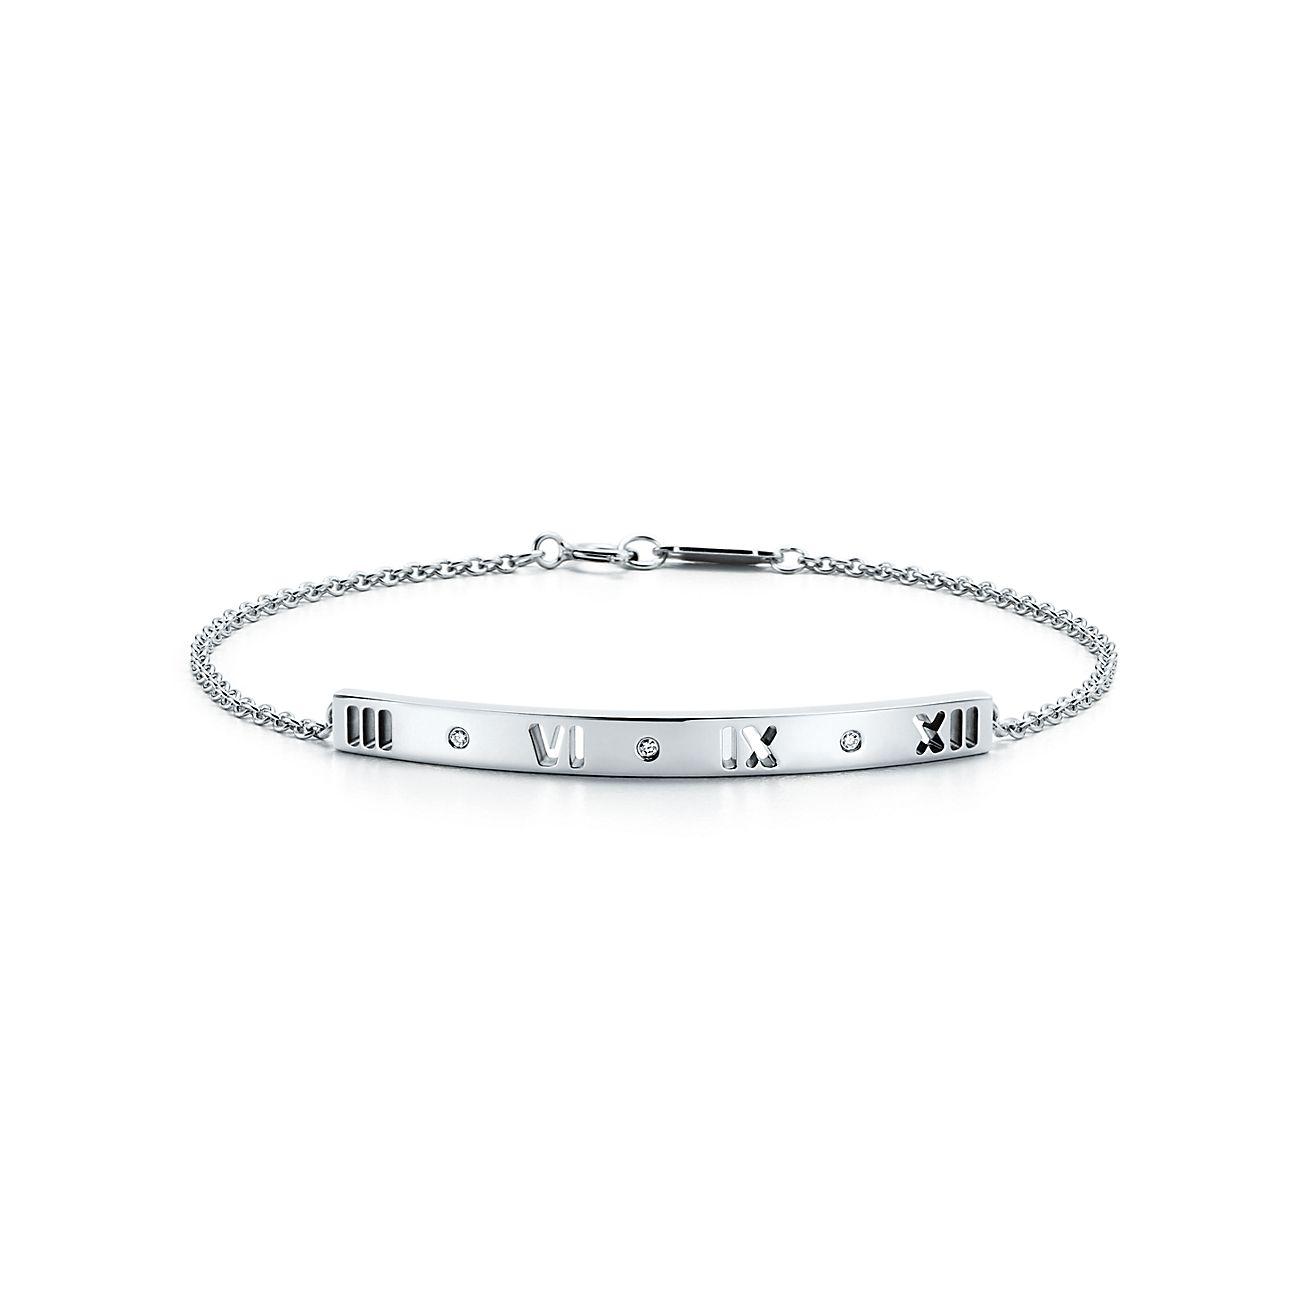 Atlas pierced bar bracelet in 18k white gold with diamonds, small Tiffany & Co.